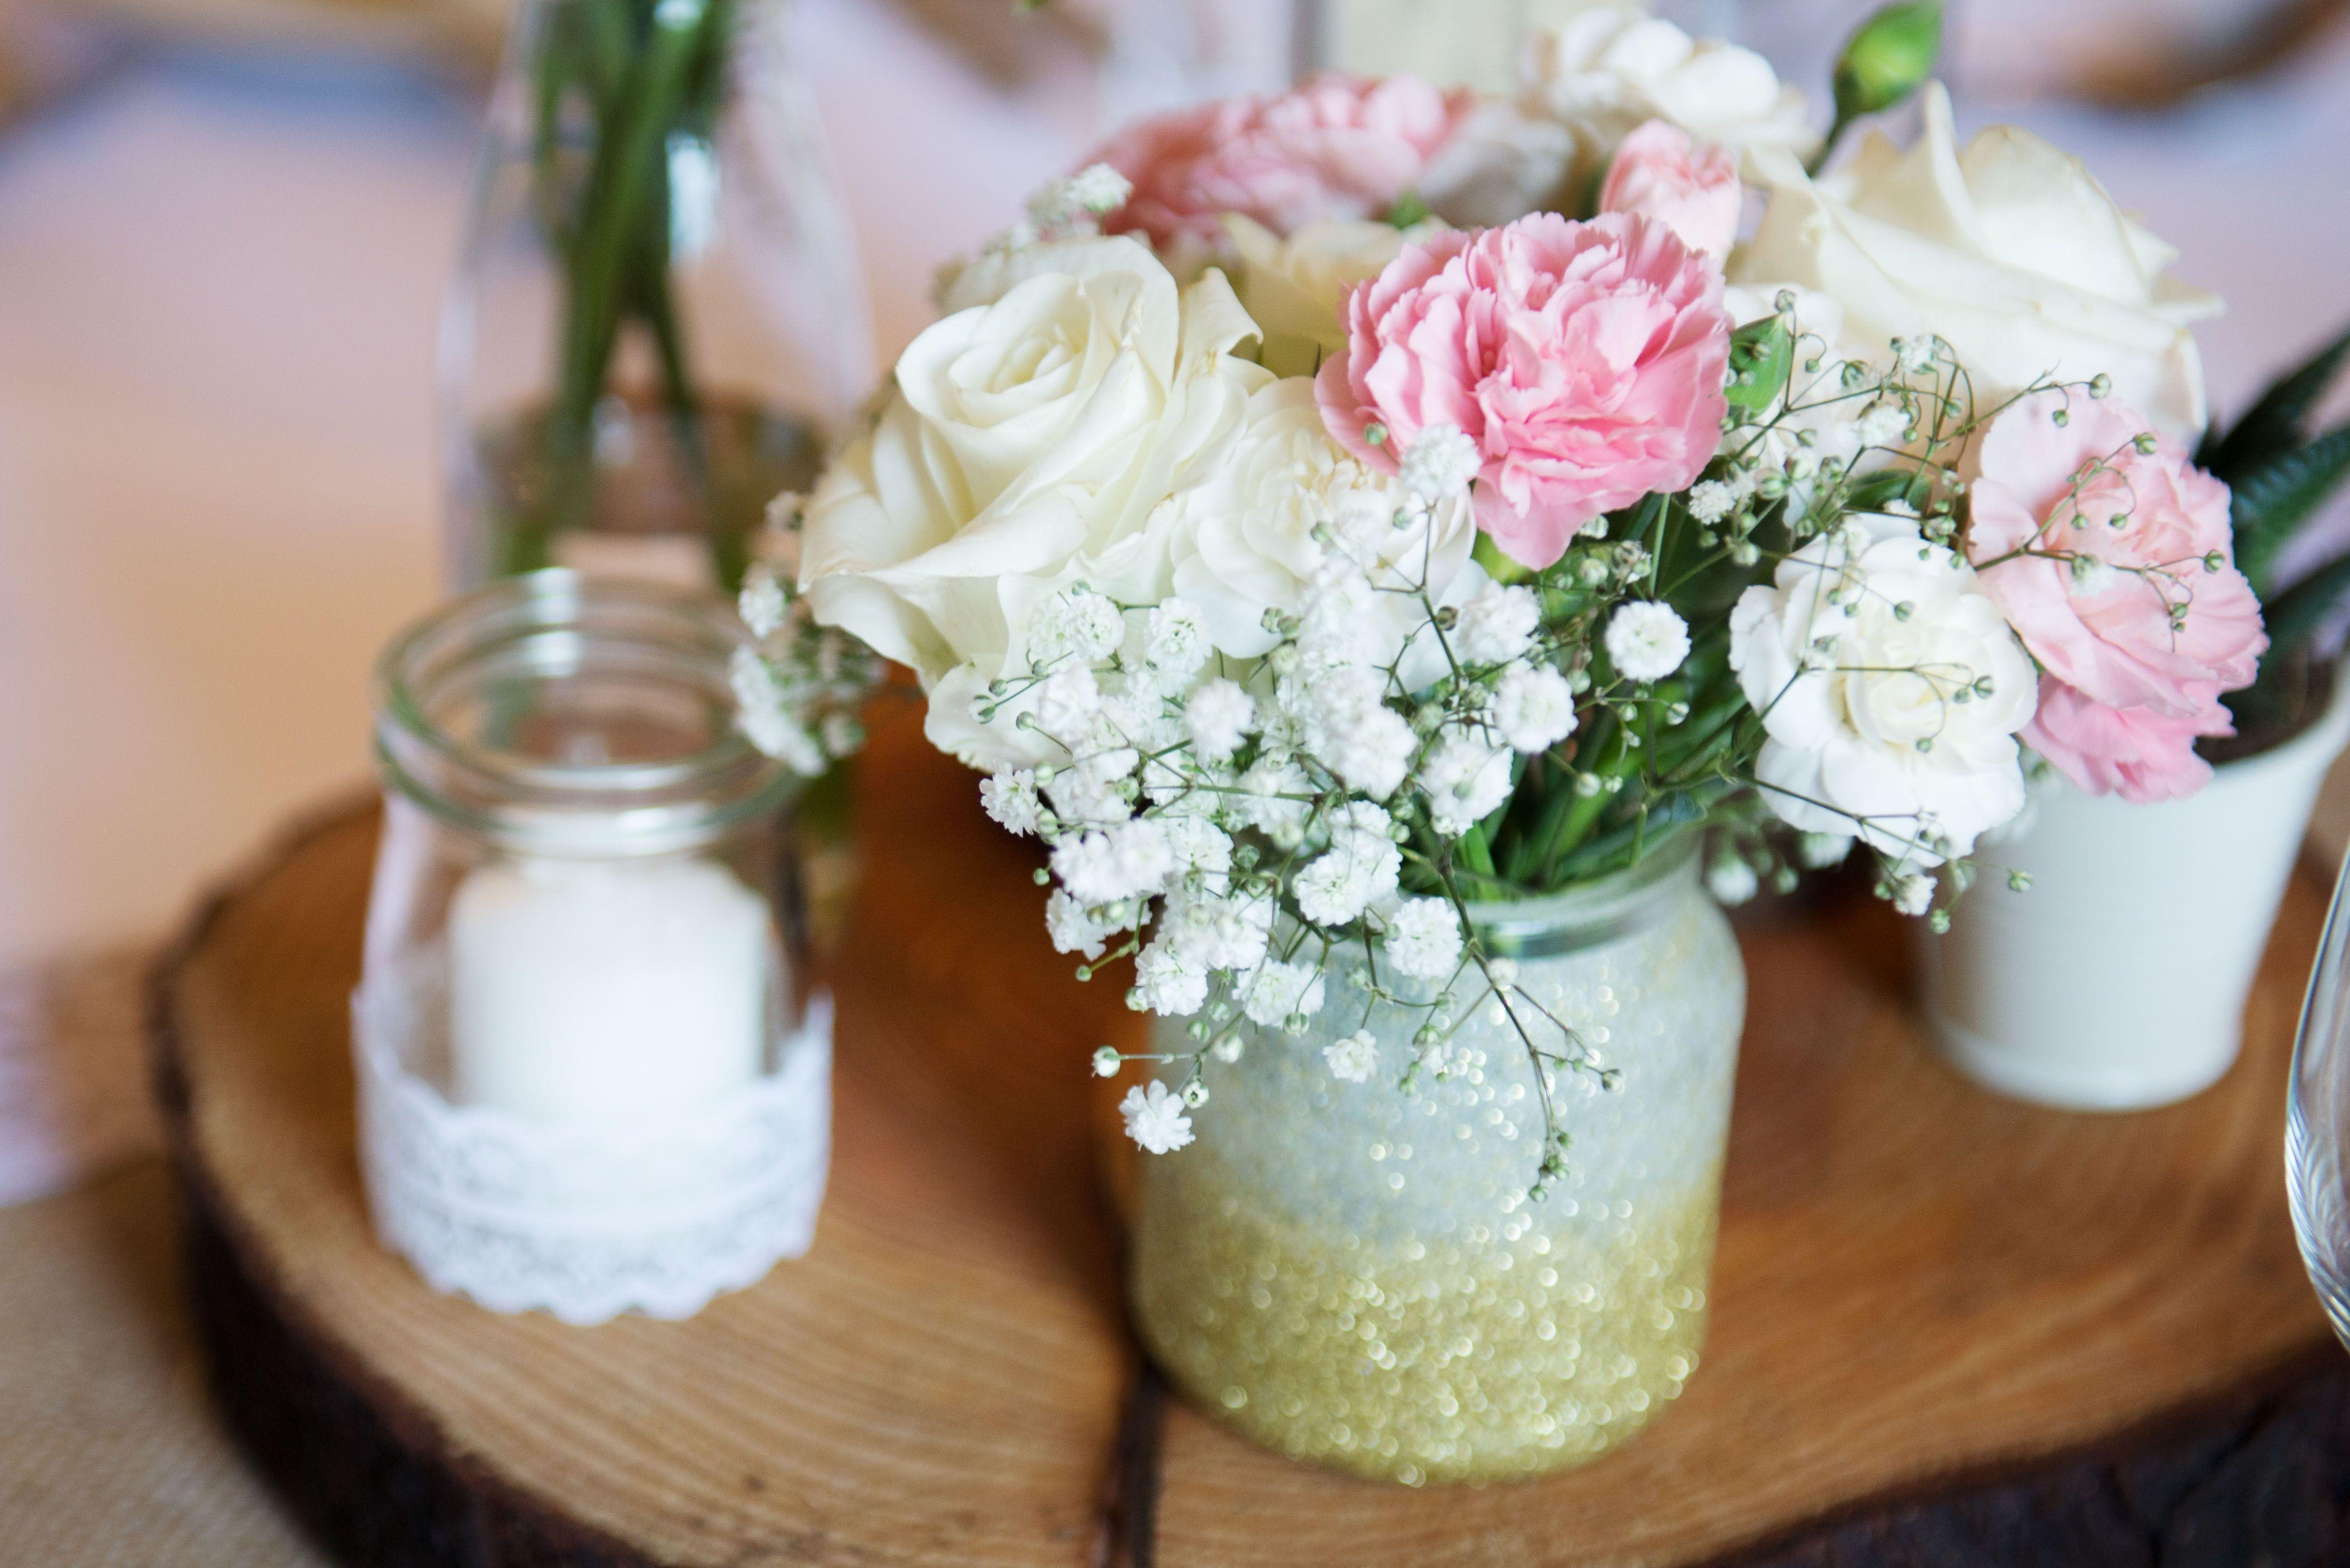 Diy vintage wedding centrepiece succulents candles bottles wood